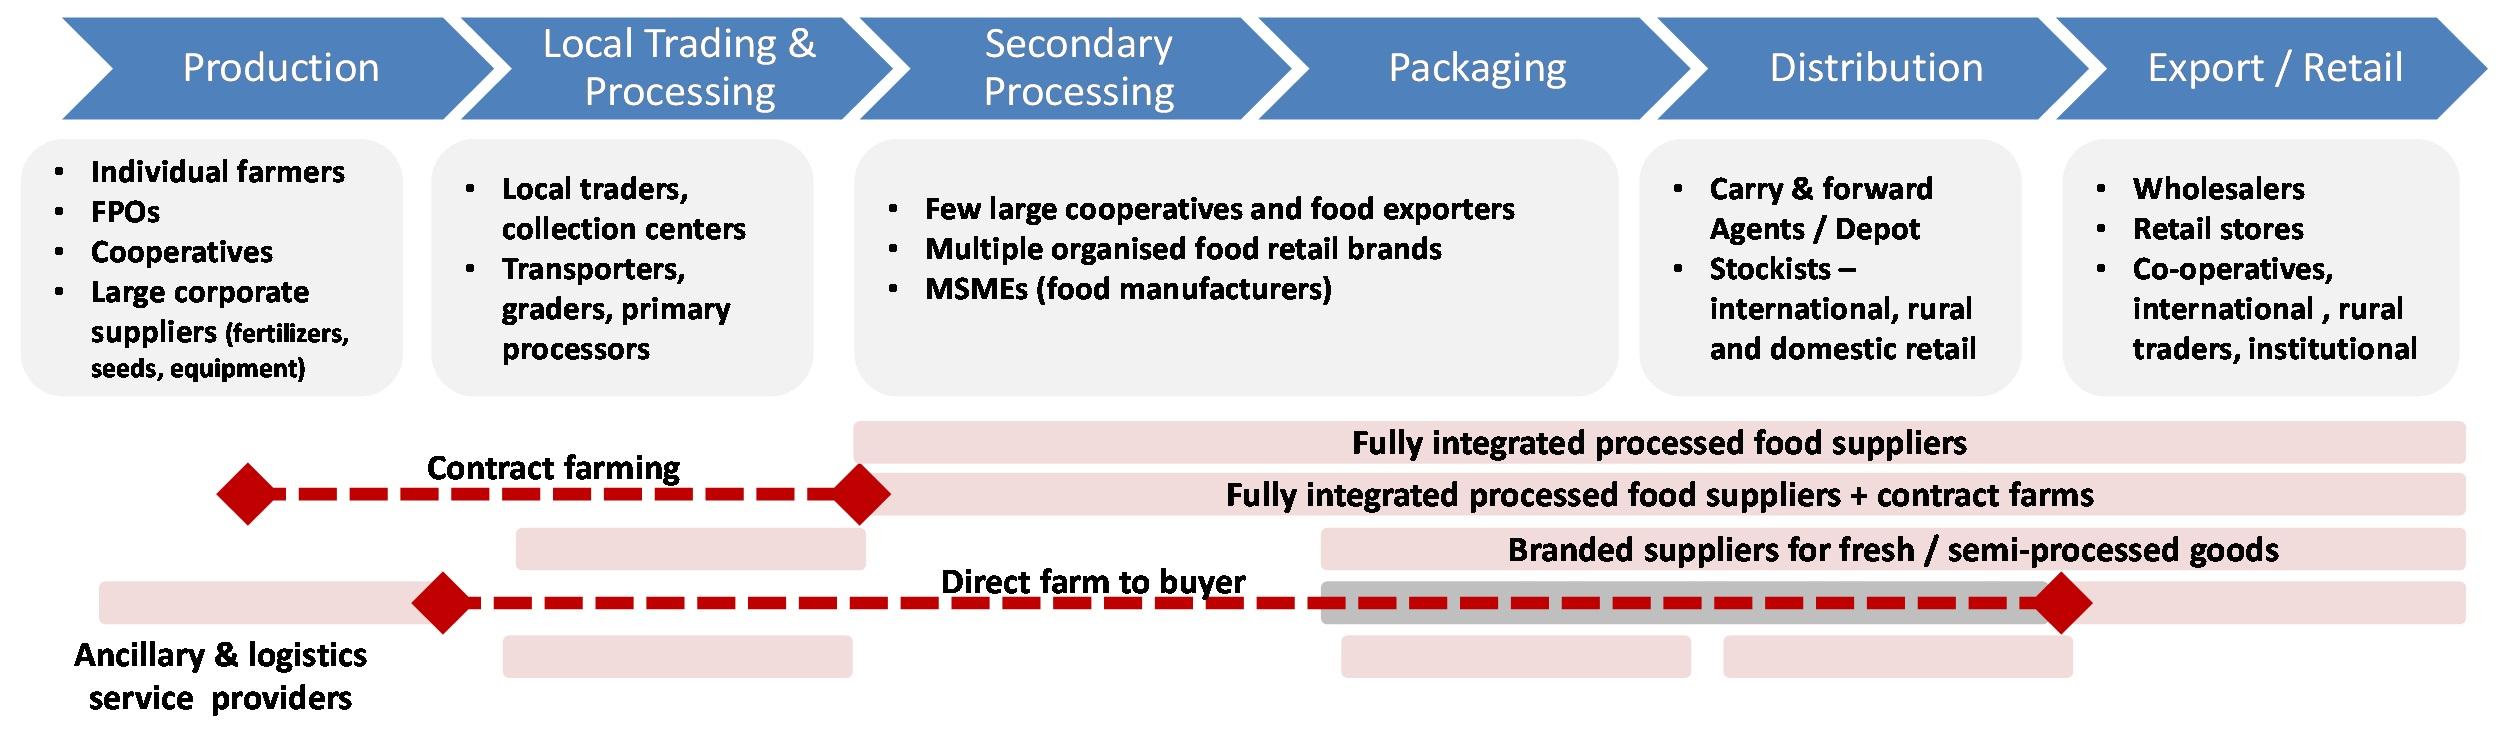 Business Models For Commercial Kitchen Having Fermentation Technology